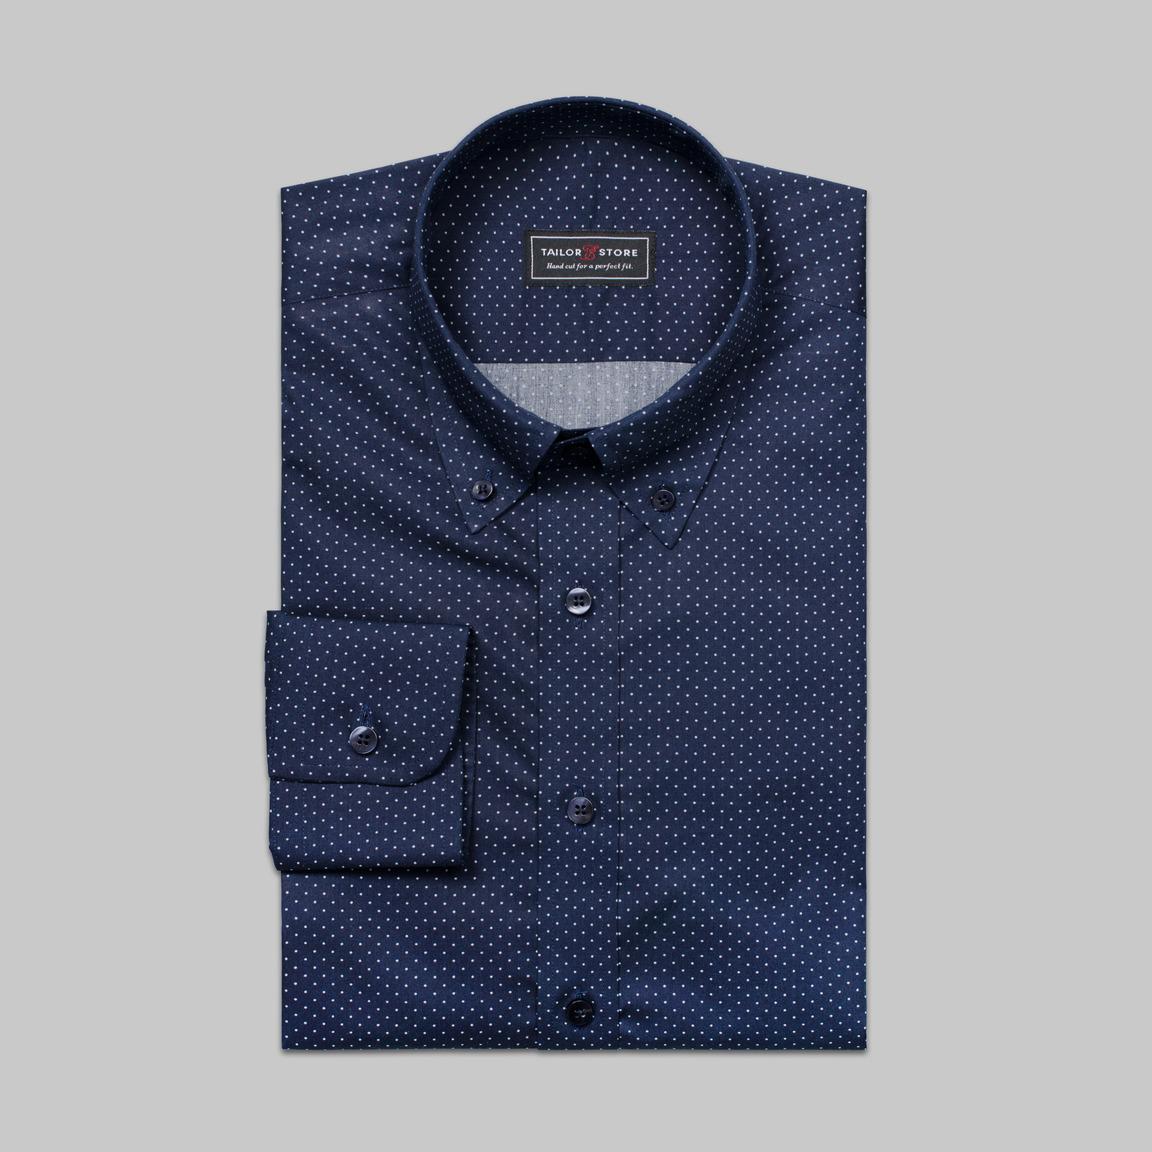 Marin/vitprickig button-downskjorta